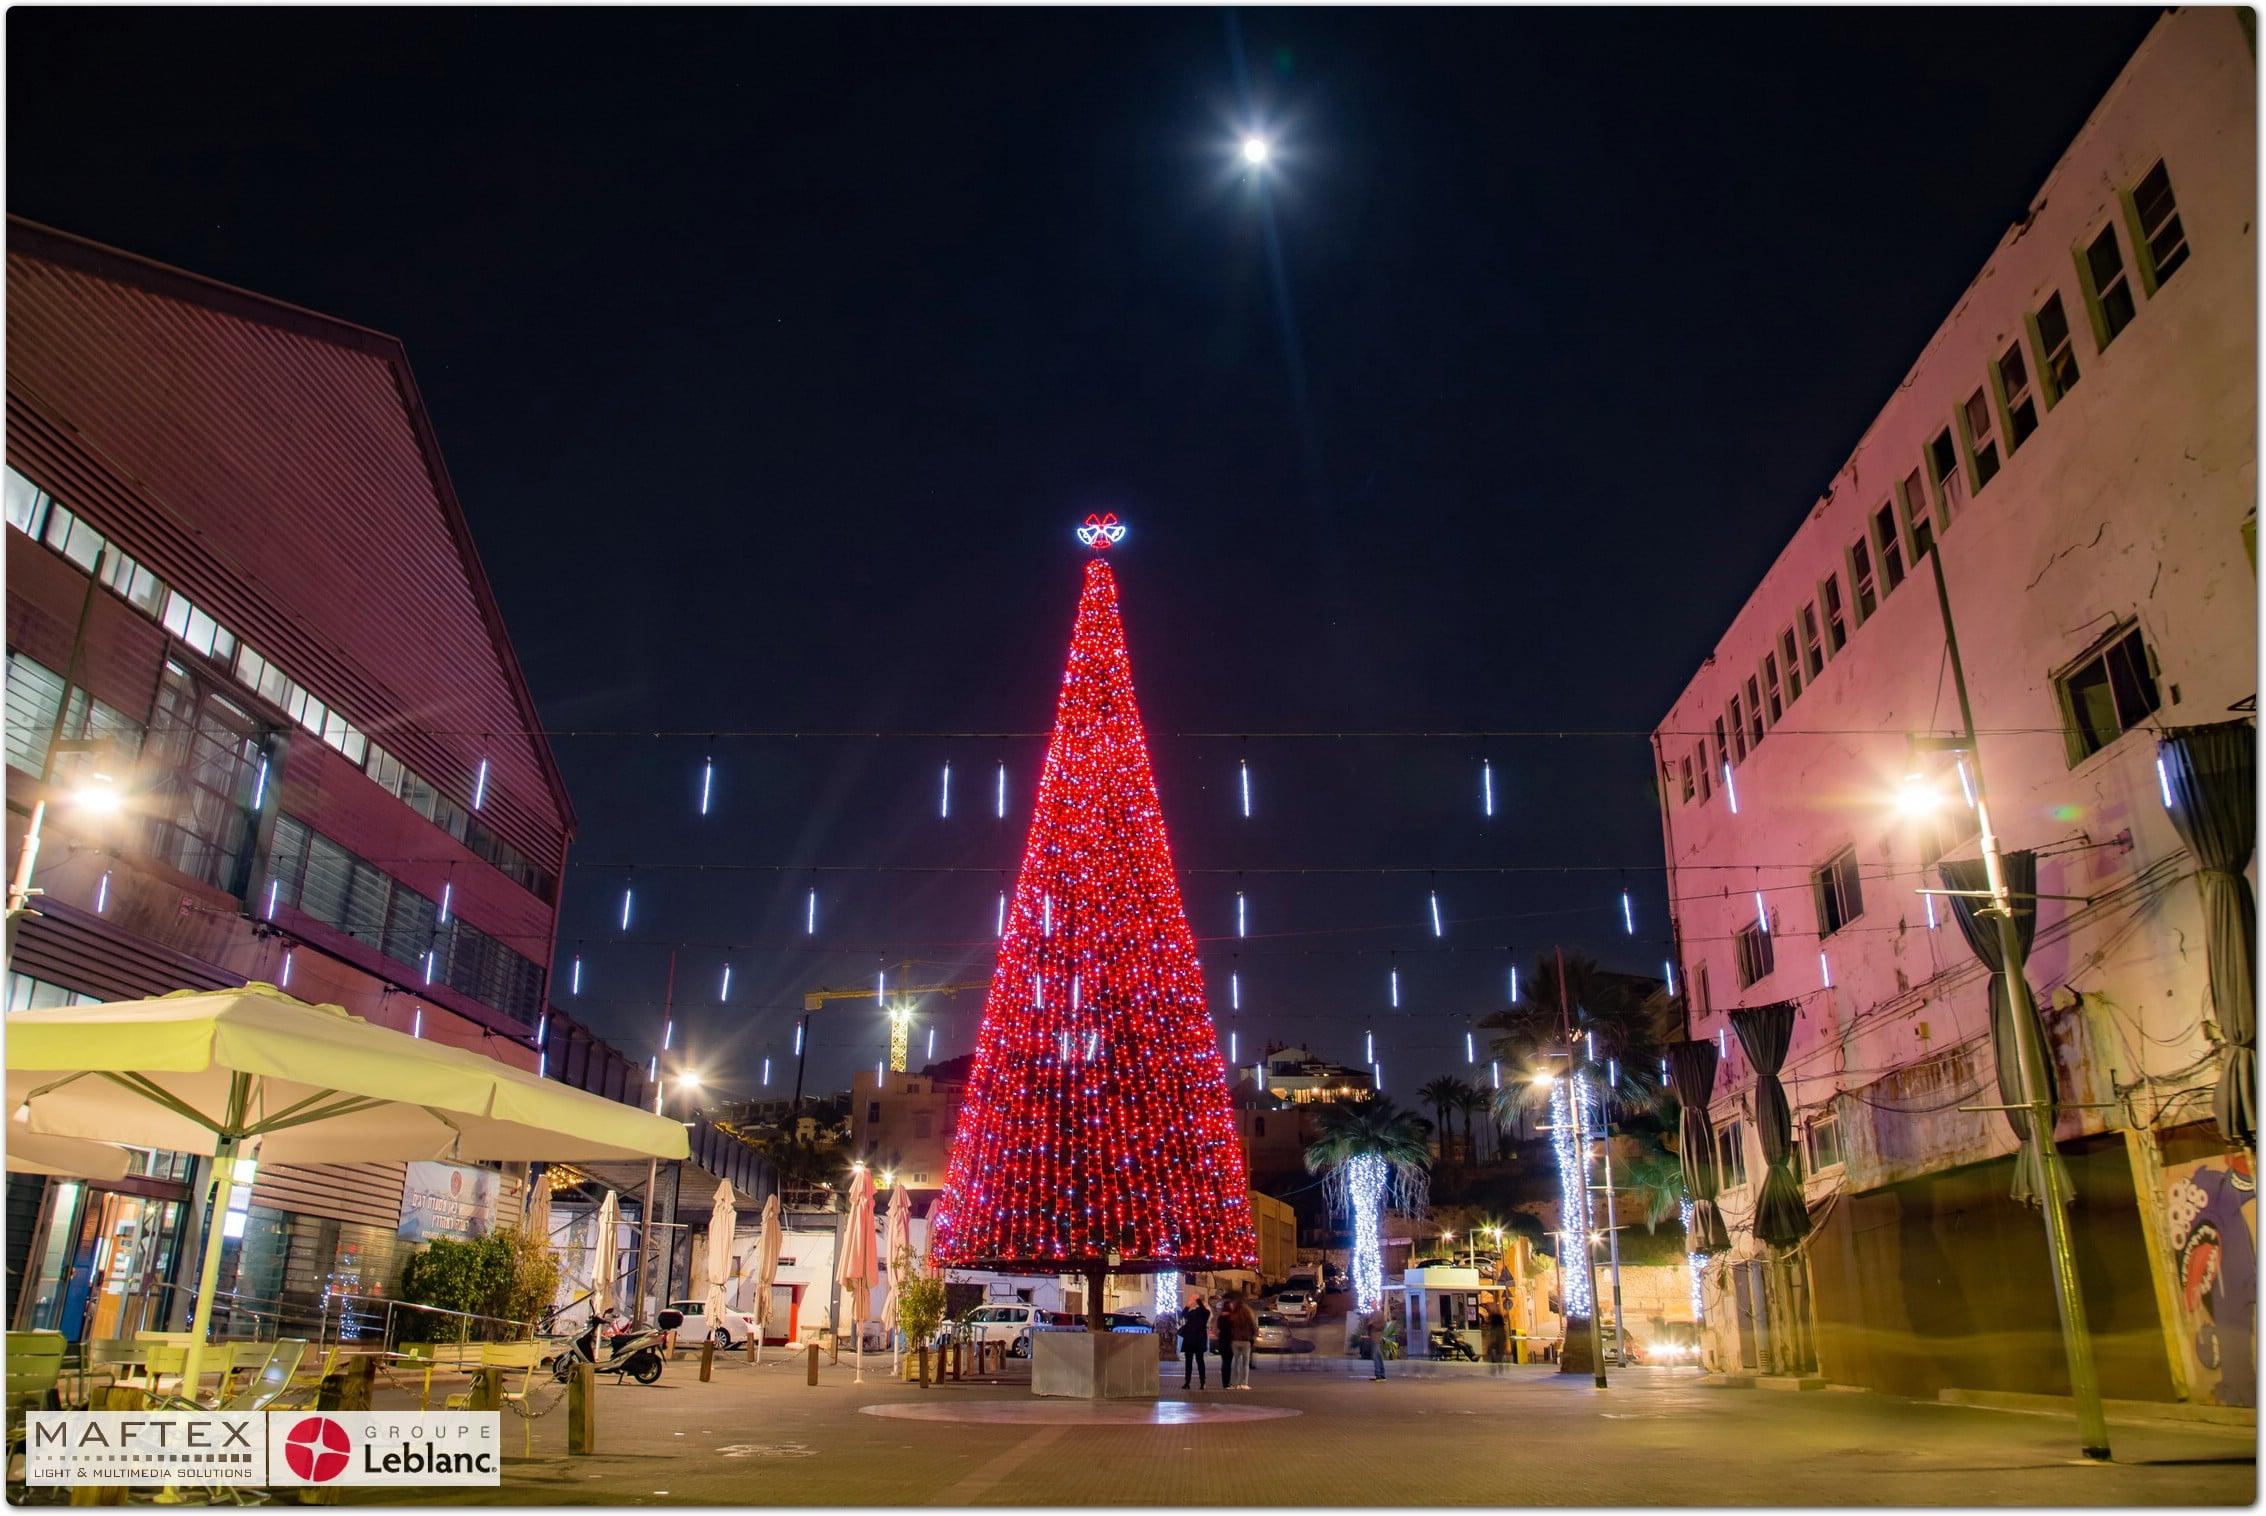 JAFFA Christmas Market Lights (2)